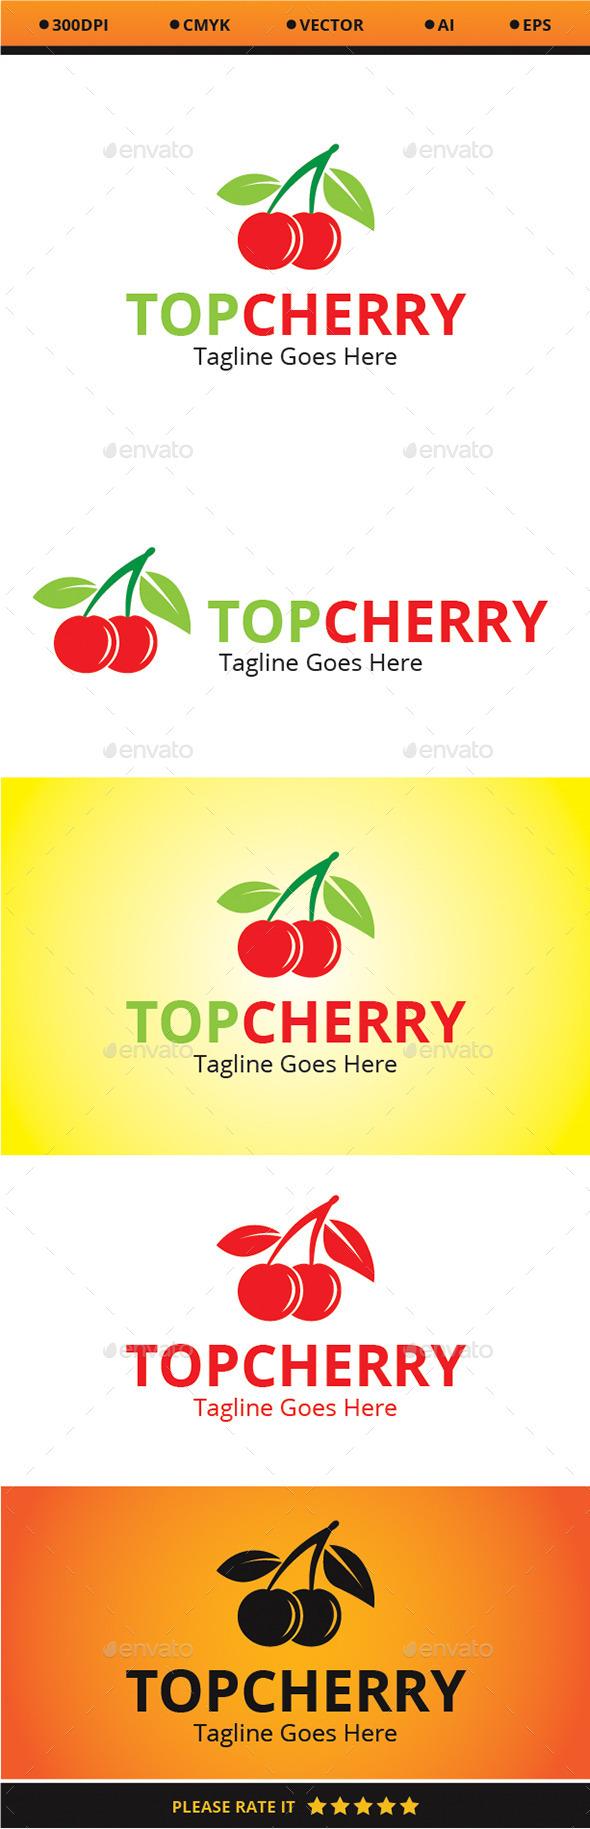 GraphicRiver Top Cherry Logo 9351092